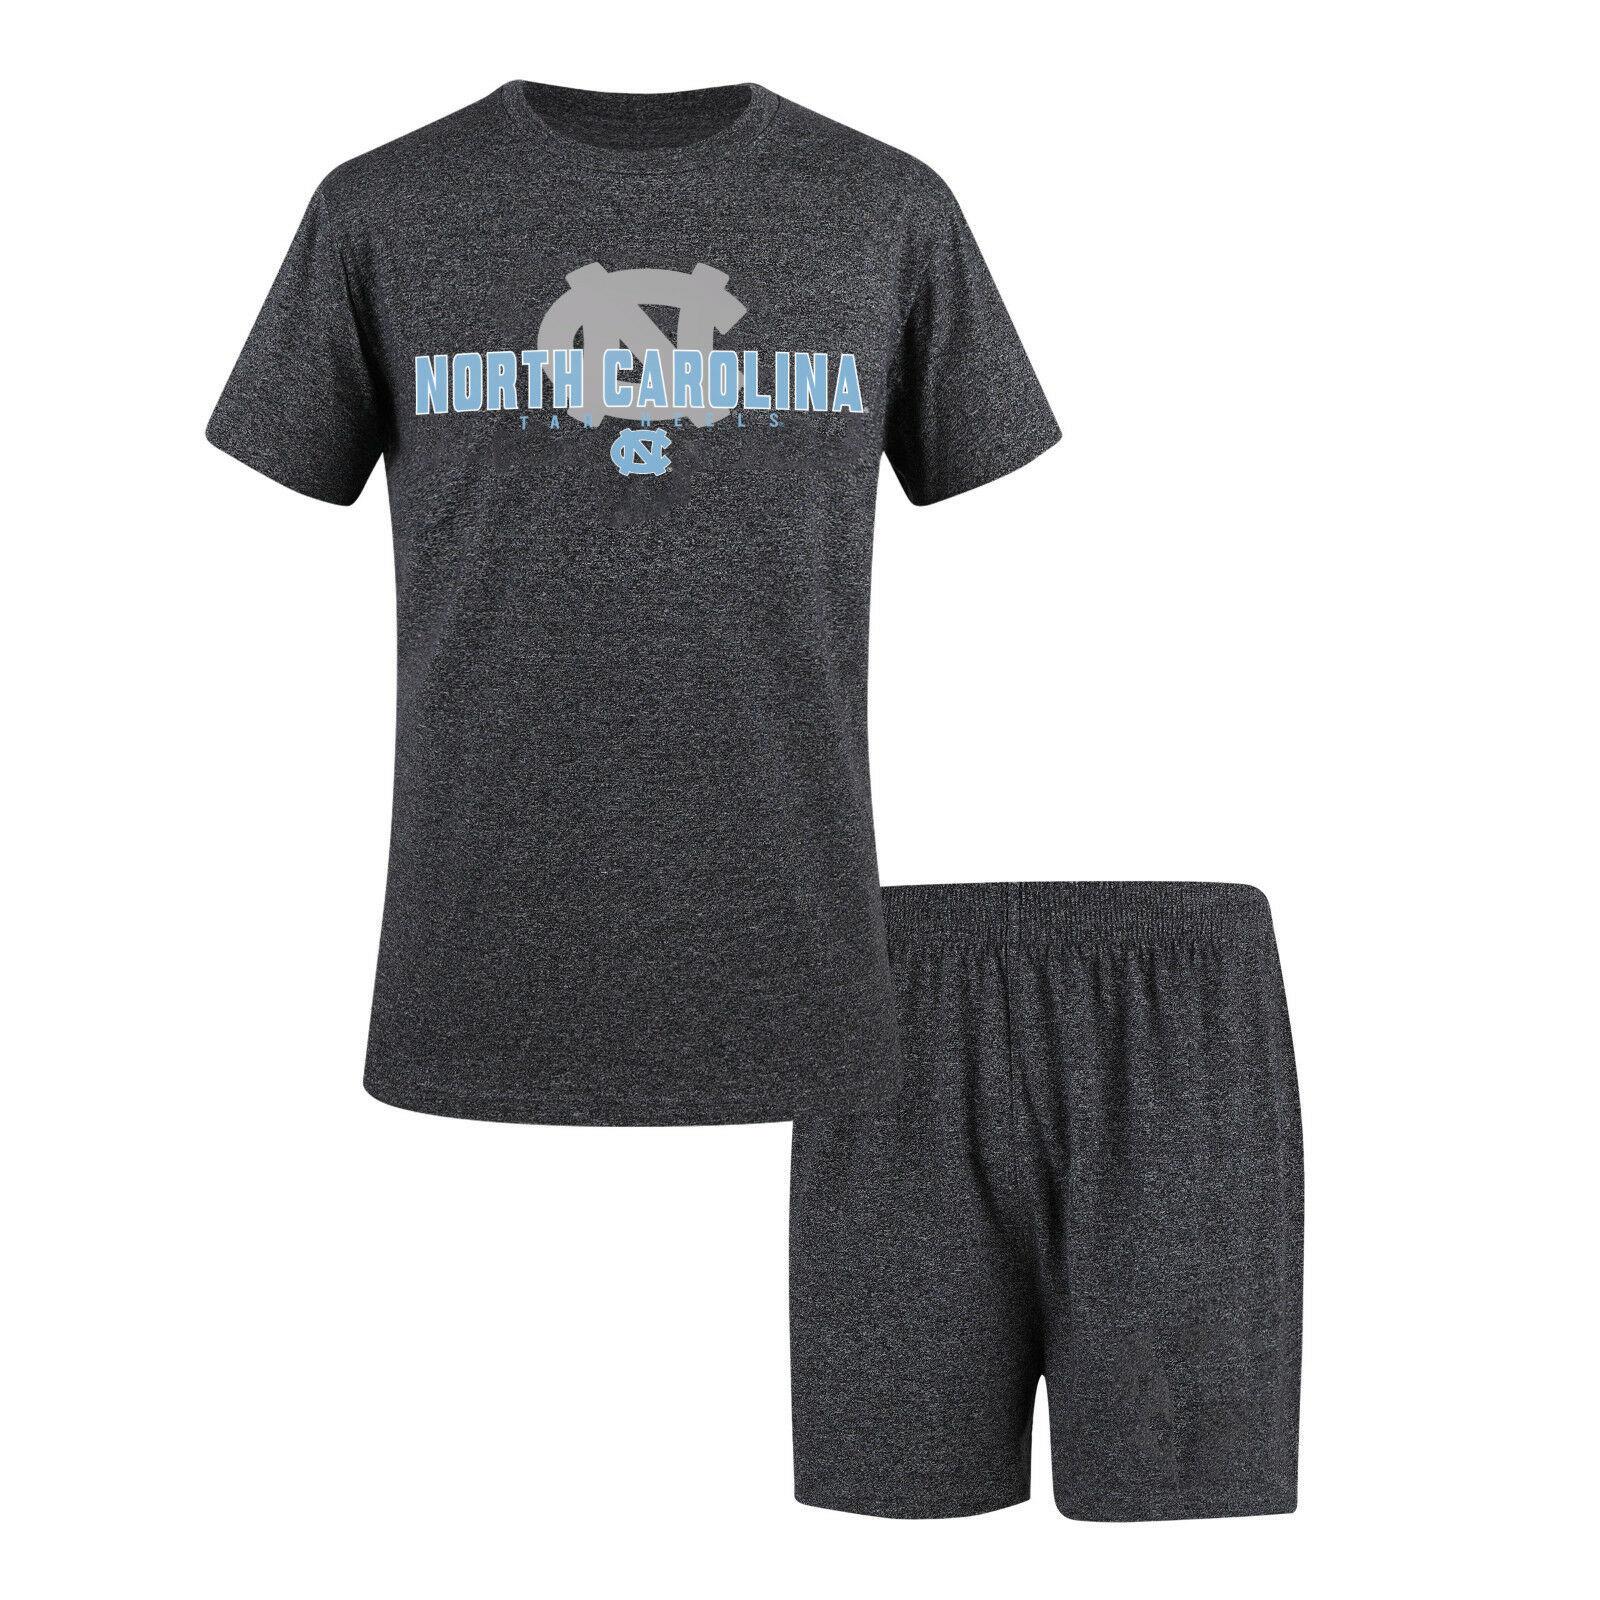 North Carolina UNC Tar Heels Men's Pajamas 2-Piece Sleep Set Shorts Tee Shirt